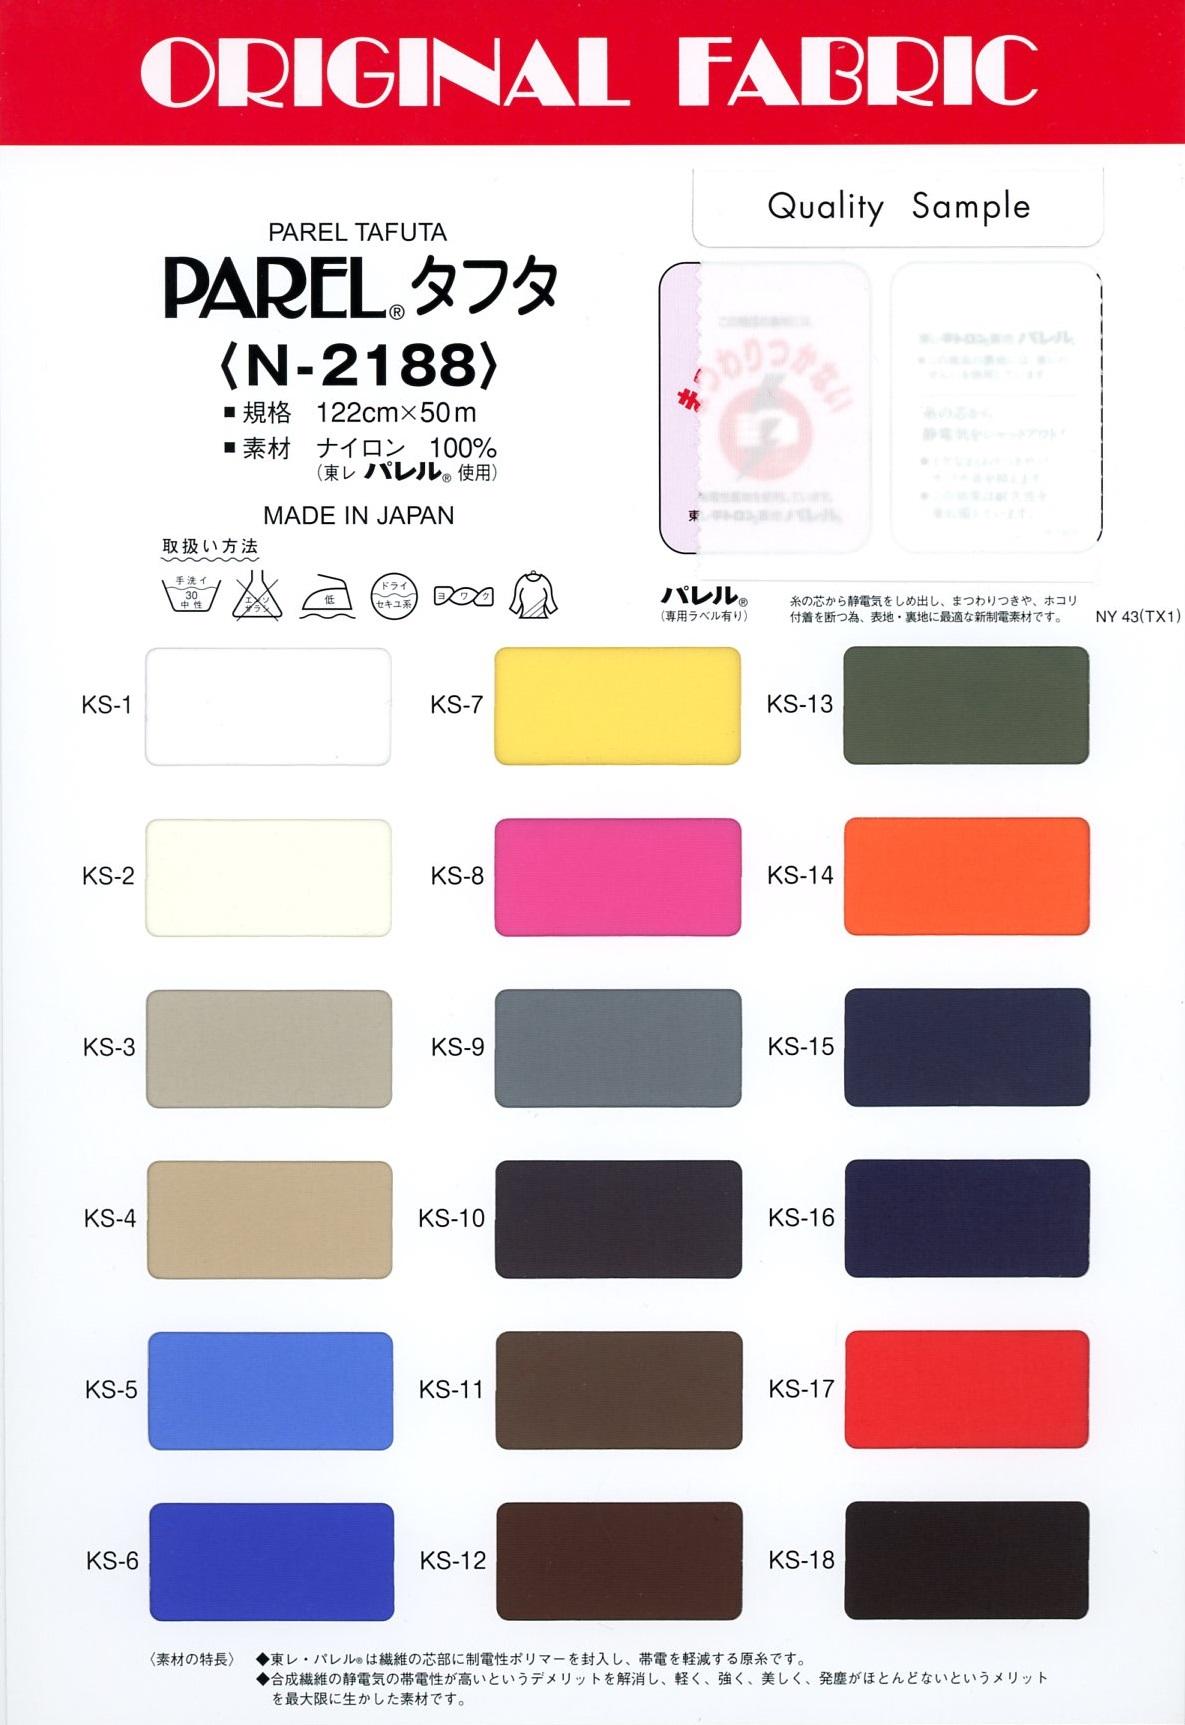 N-2188 PAREL®︎タフタ[生地] Masuda(マスダ)/オークラ商事 - ApparelX アパレル資材卸通販